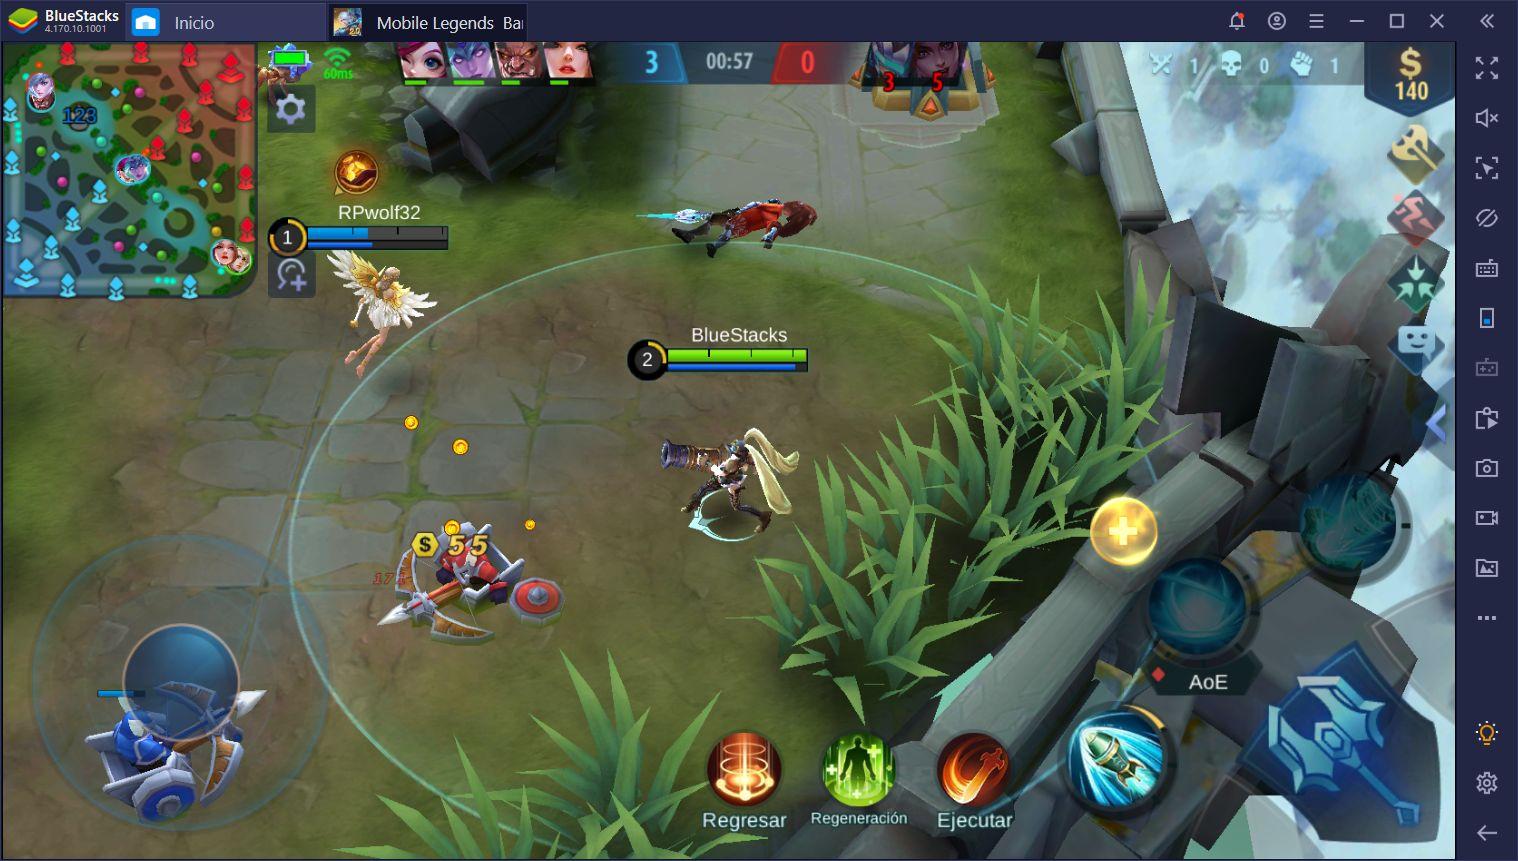 5 Razones Para Volver a Jugar Mobile Legends: Bang Bang en BlueStacks